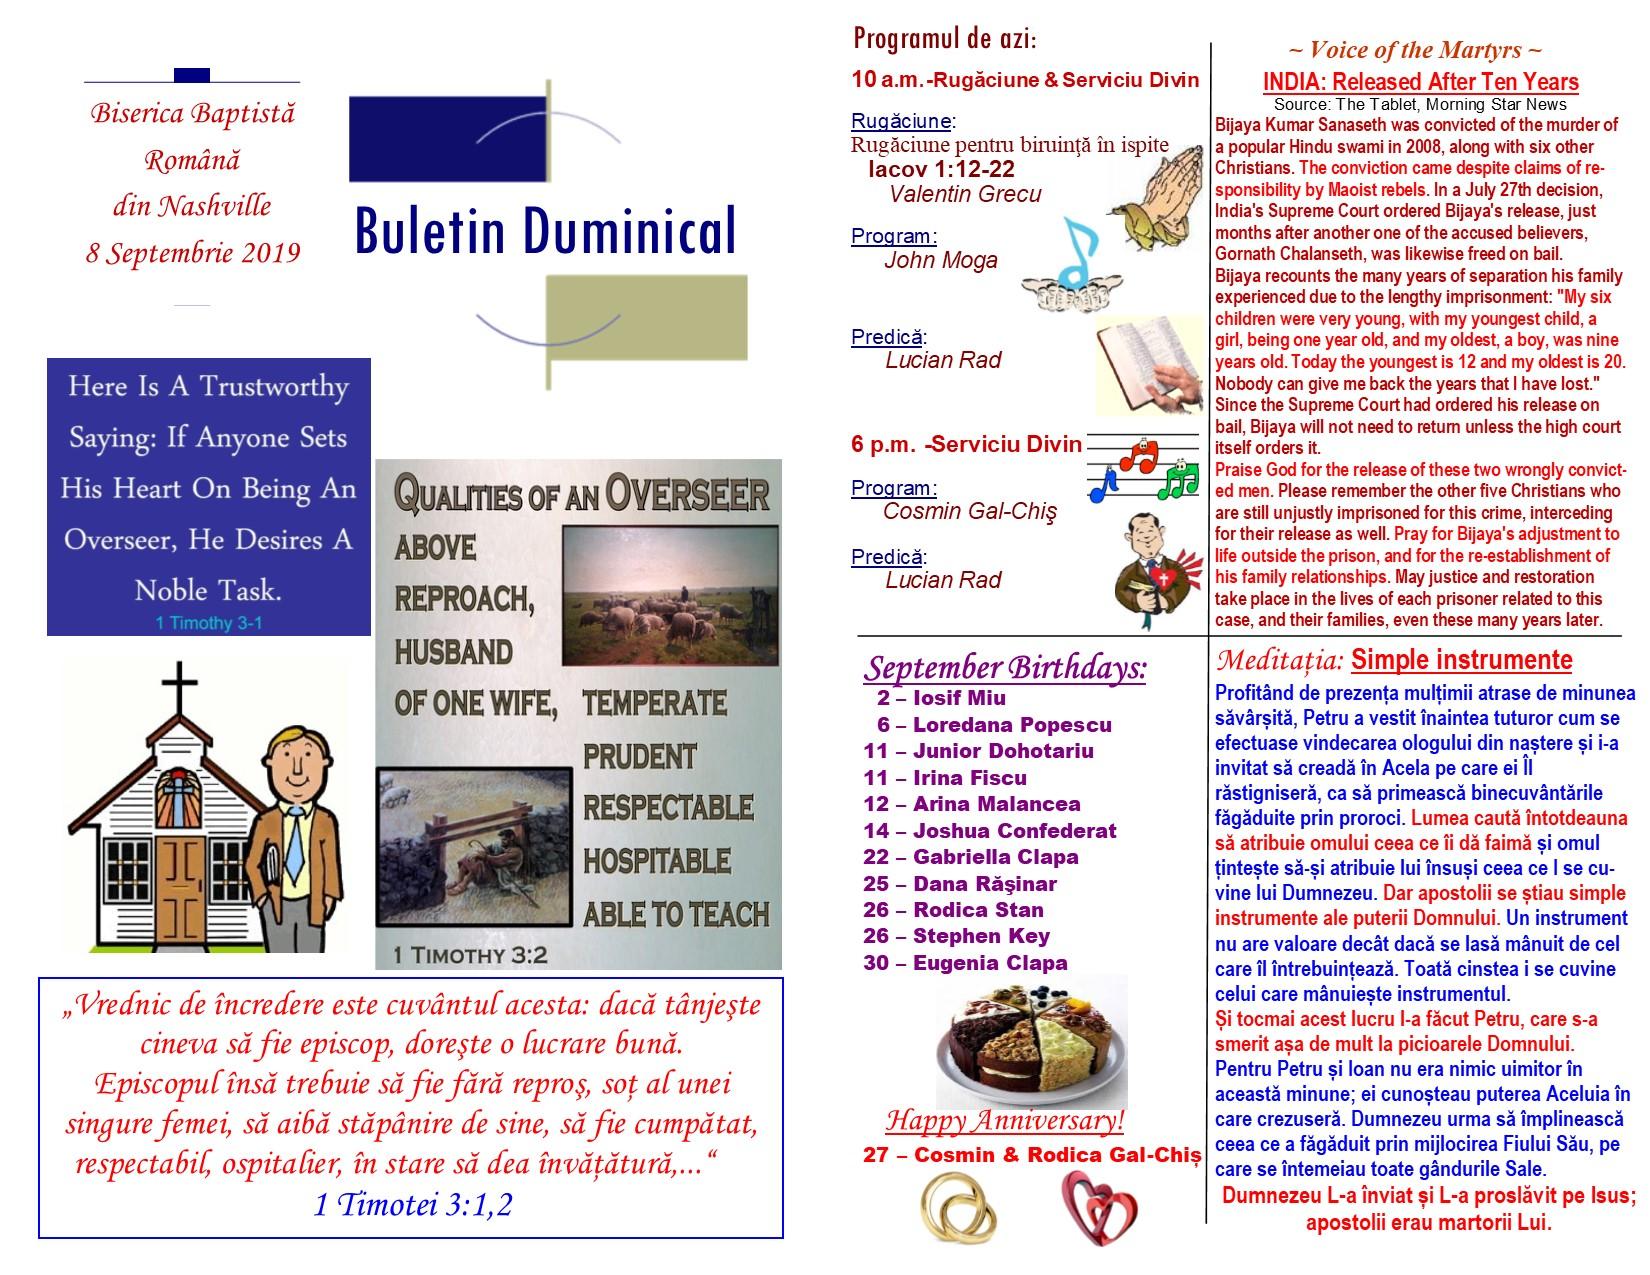 Buletin 09-08-19 page 1 & 2